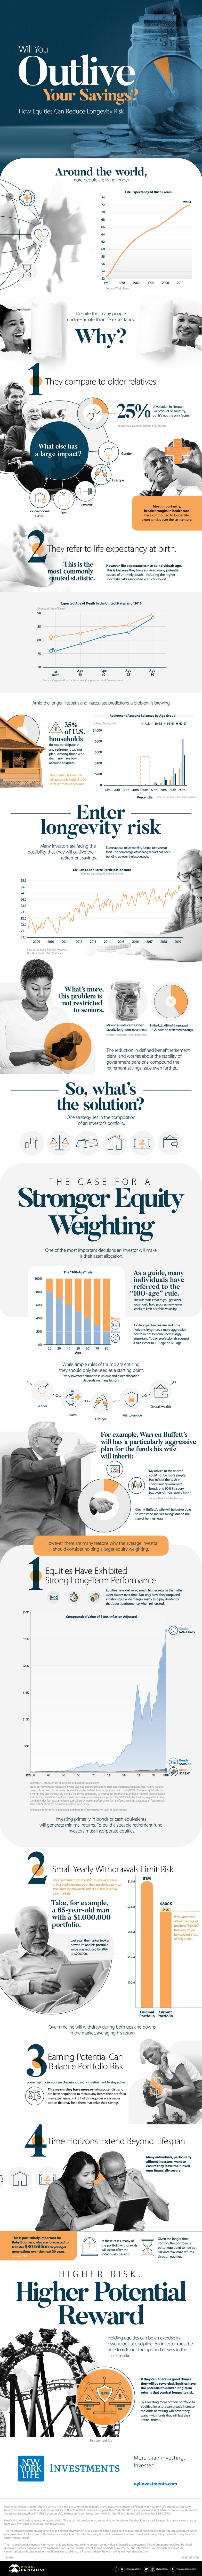 equities-reduce-risk.jpg